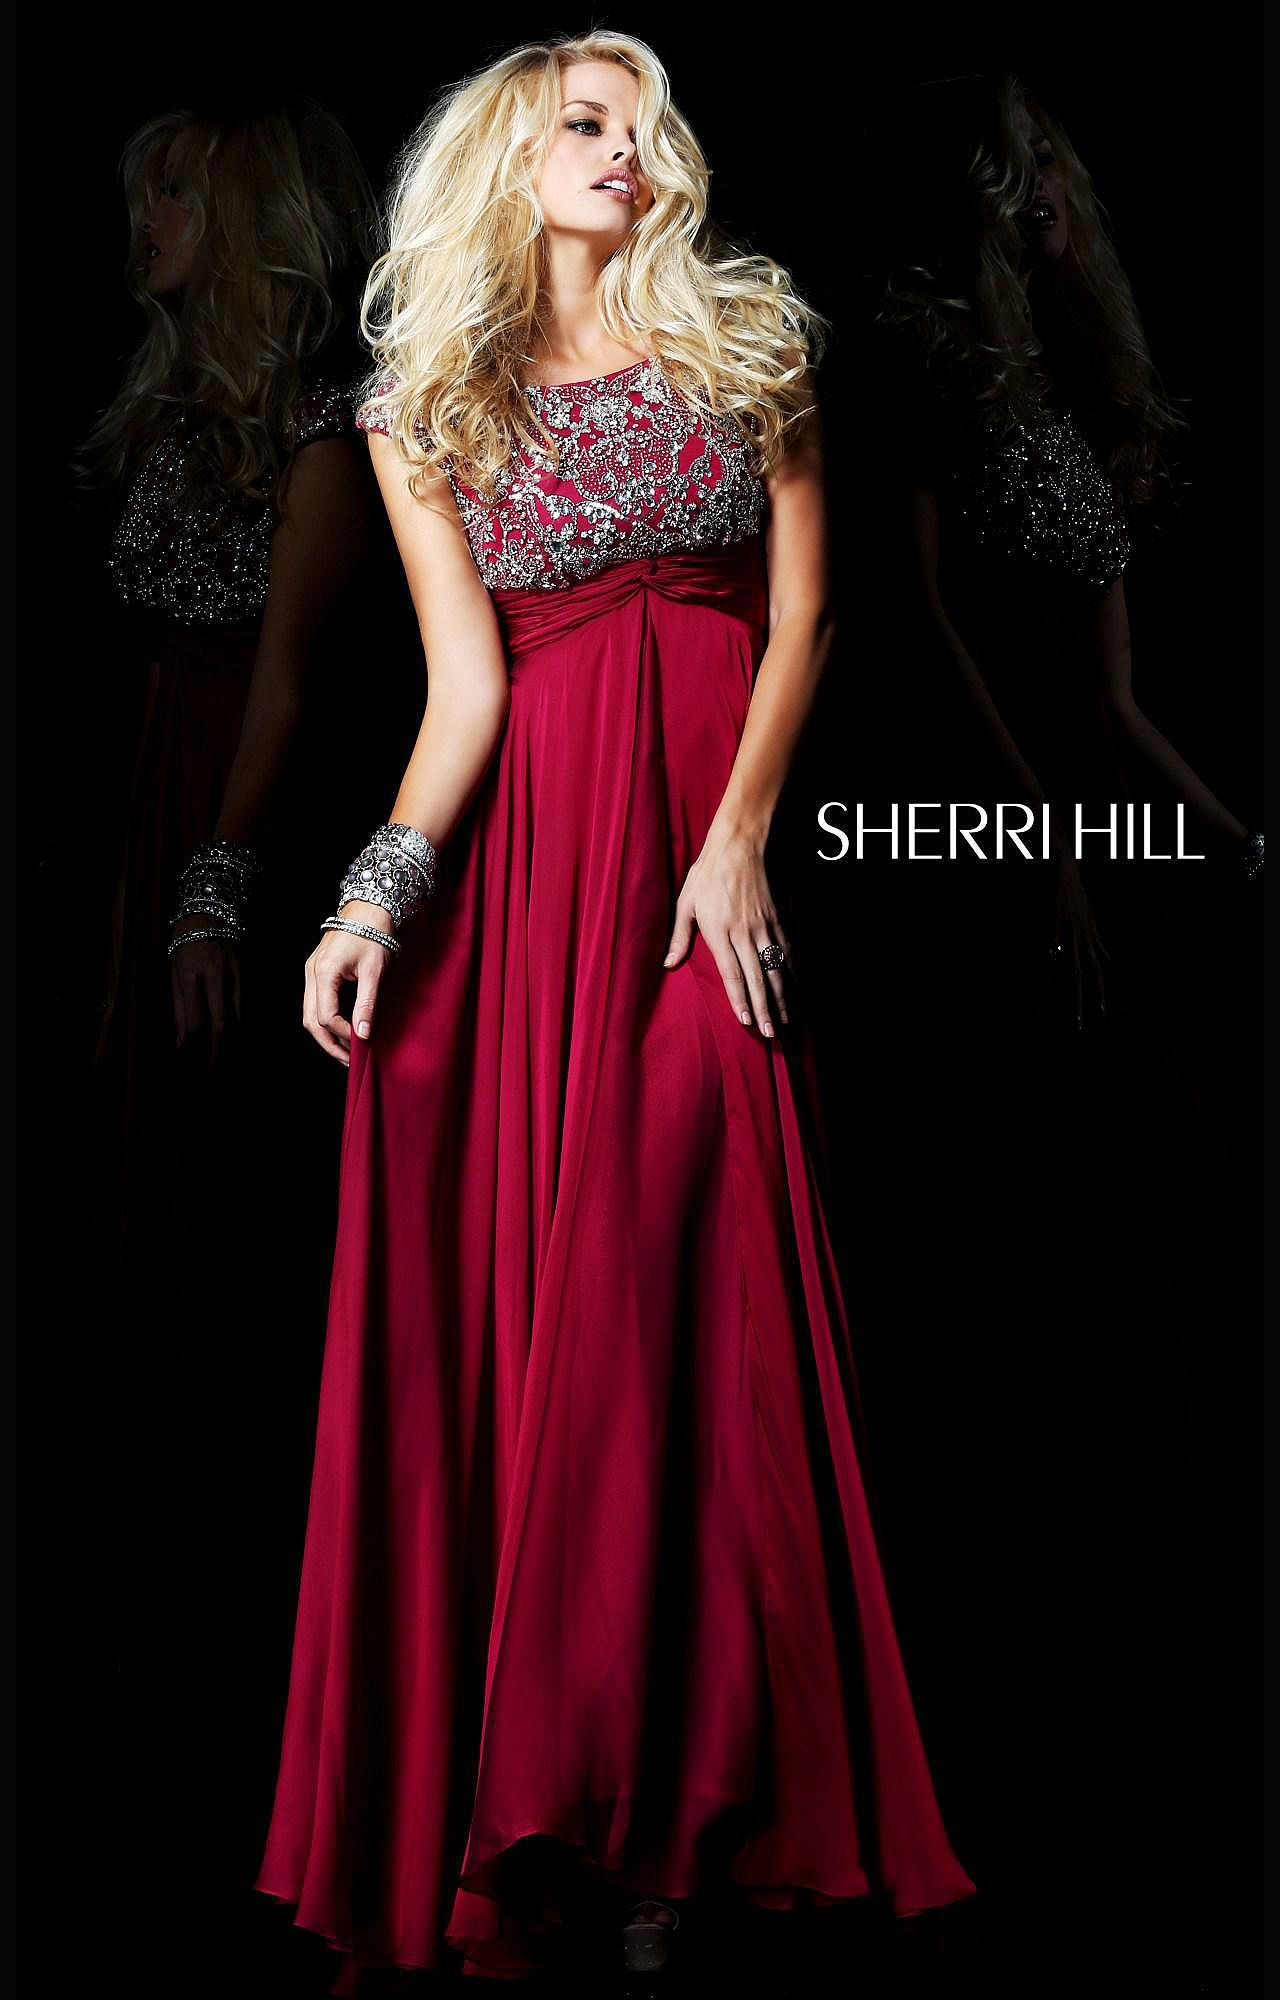 Sherri hill on genealogy prom pinterest prom